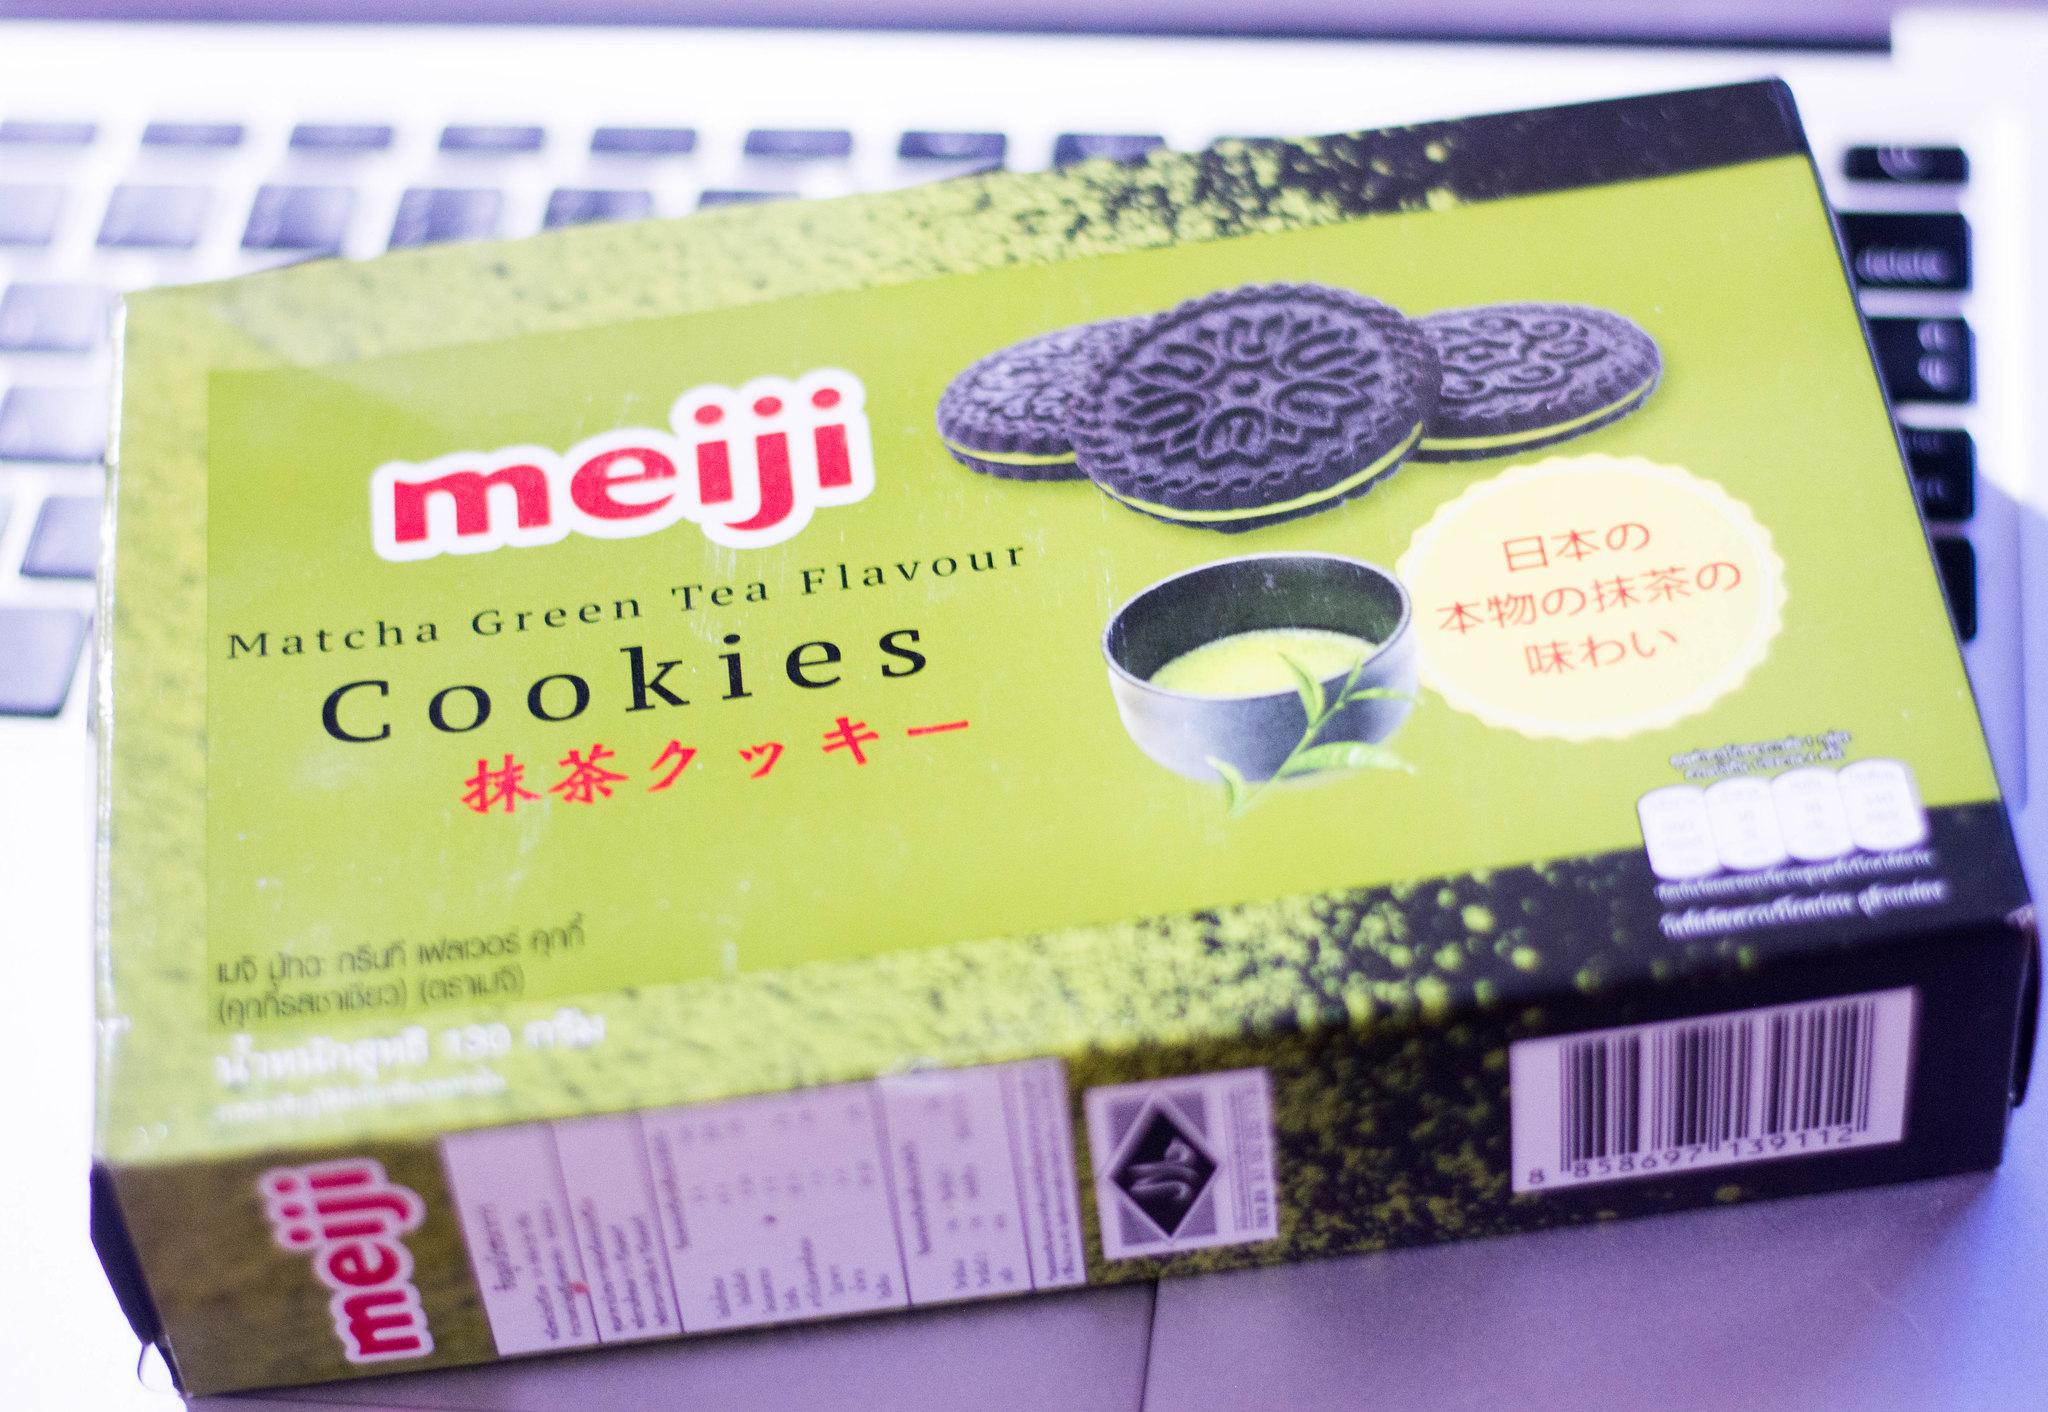 Meiji Matcha Green Tea Flavour